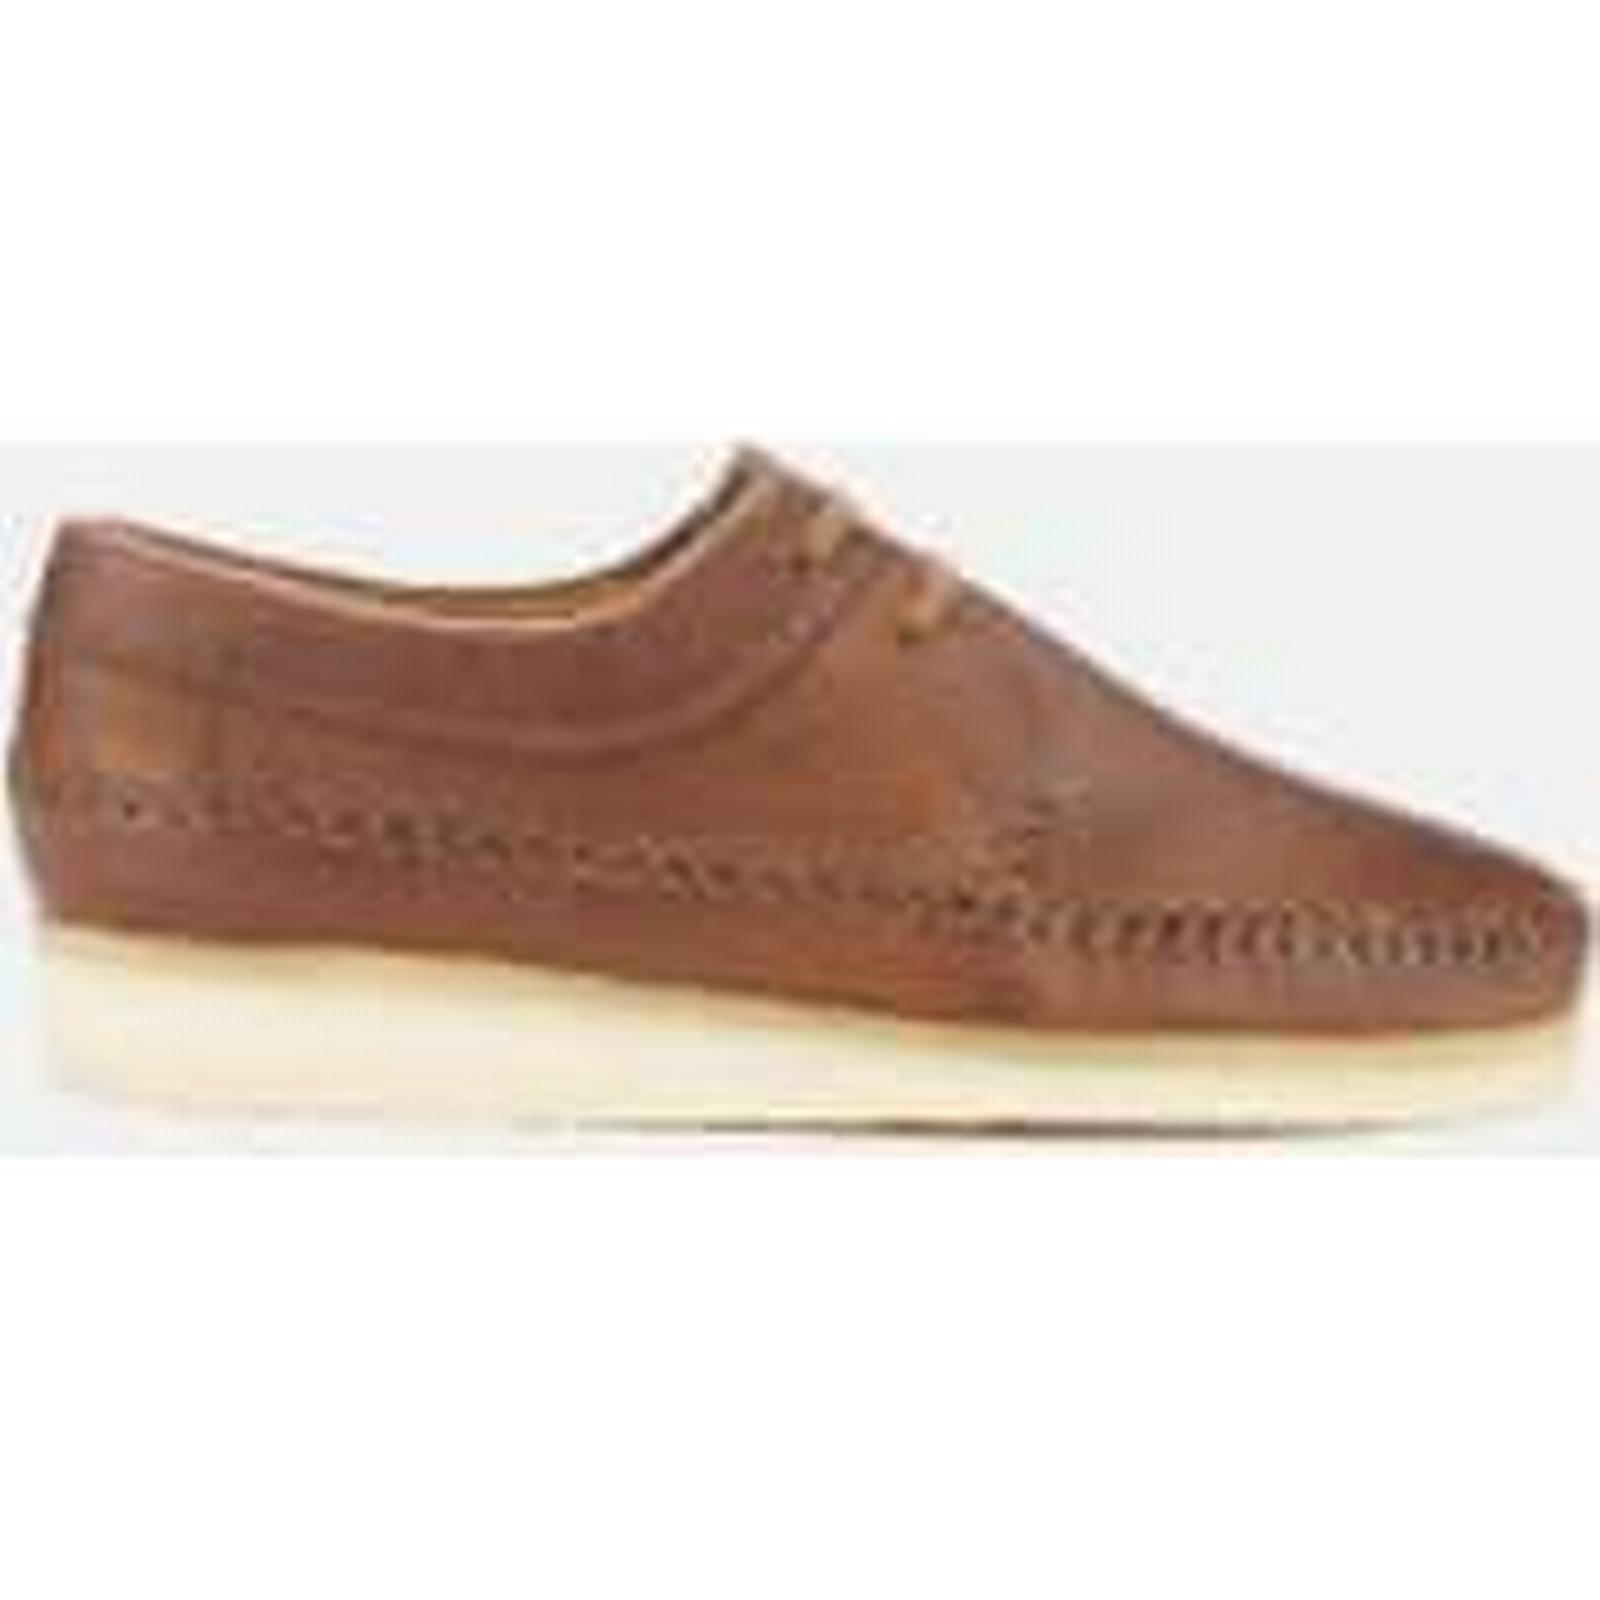 Clarks Originals UK Men's Weaver Shoes - Tan Leather - UK Originals 11 - Tan c034f6